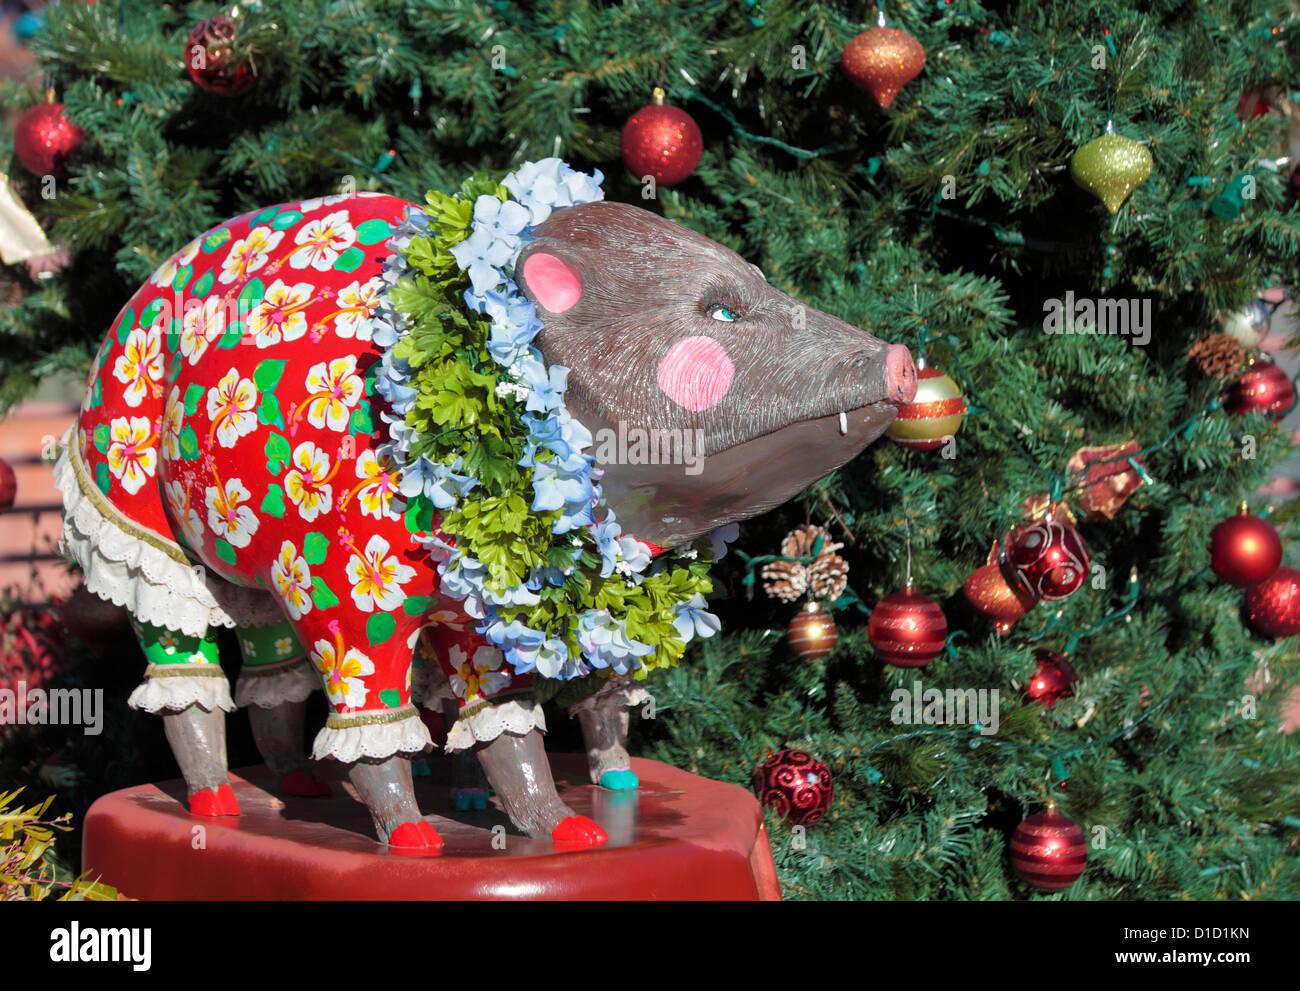 Christmas Tree Hawaii Part - 38: Hawaii-theme Javelina Artwork By Christmas Tree On Display In The City Of  Sedona During The Holiday Season